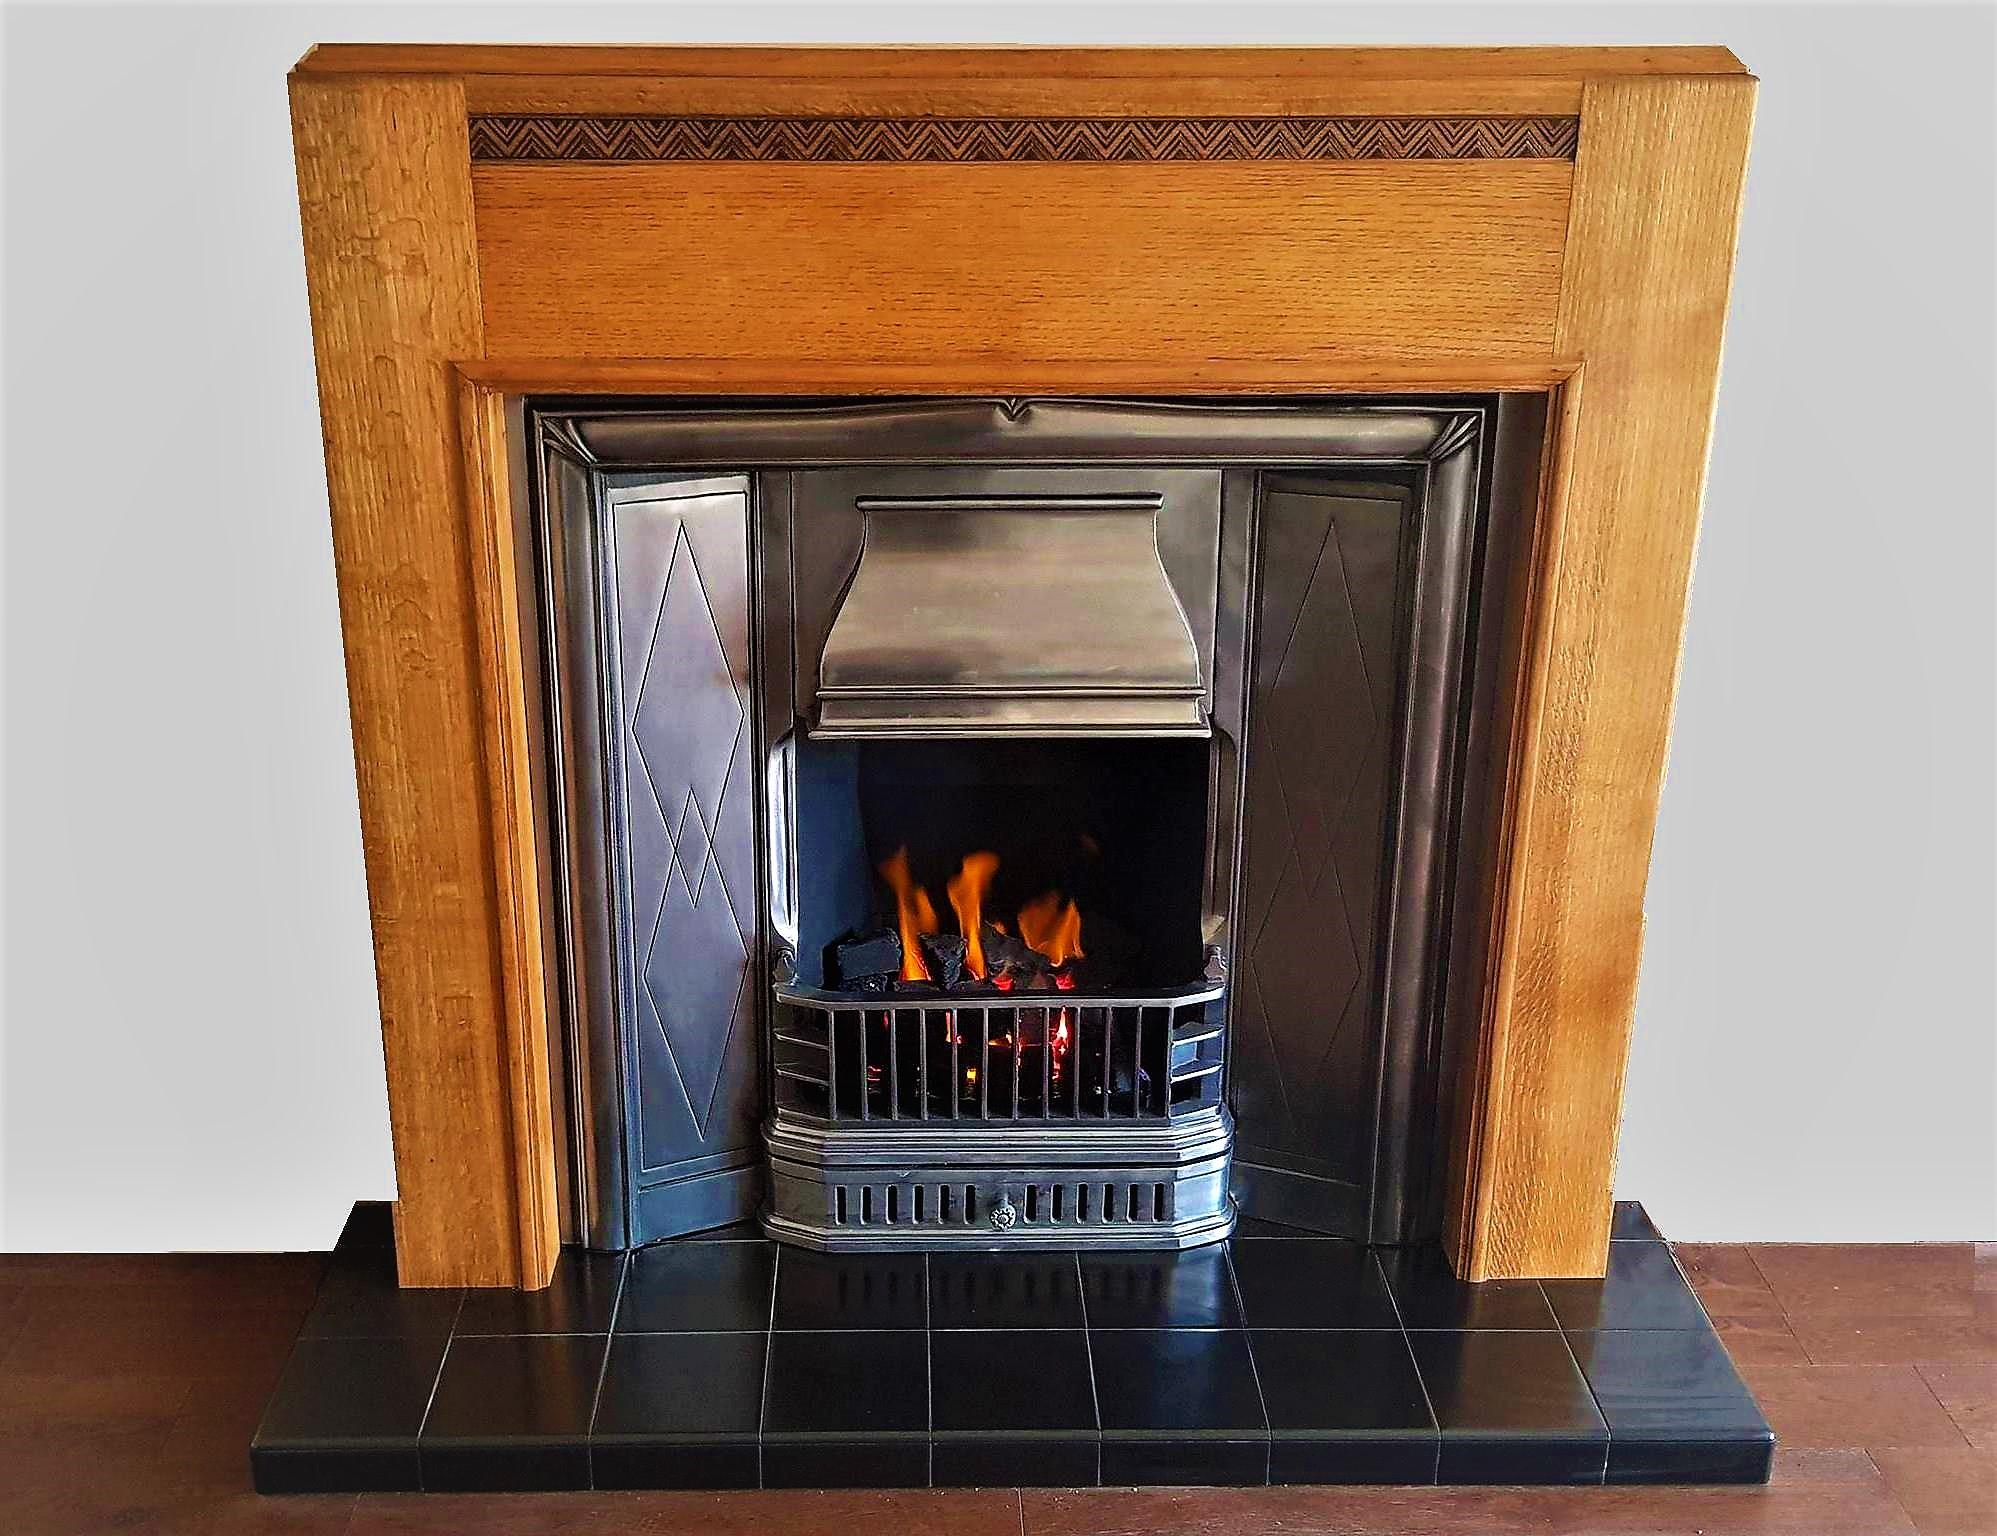 The Retro 1930s Period Cast Iron Insert Fireplace